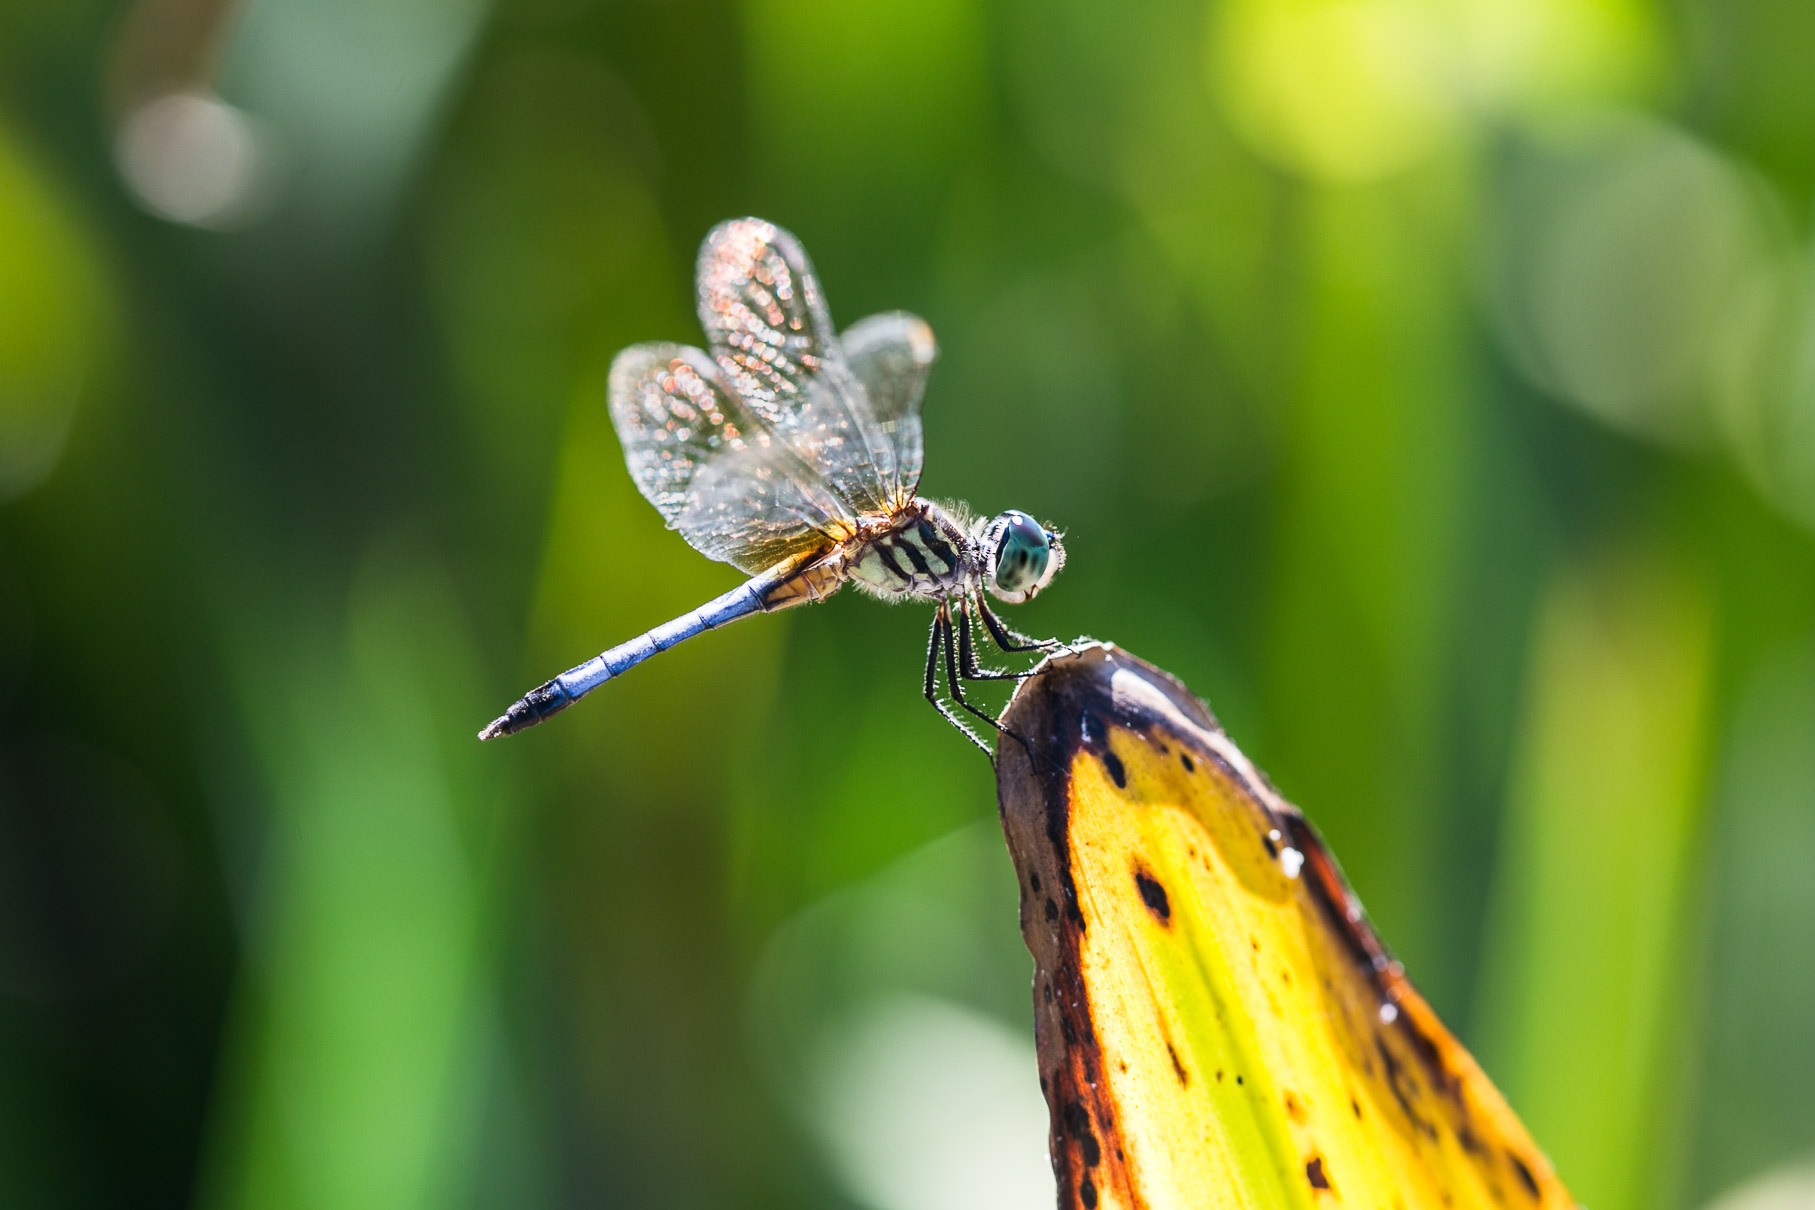 alexa-wright-color-photography-dragonfly.jpg